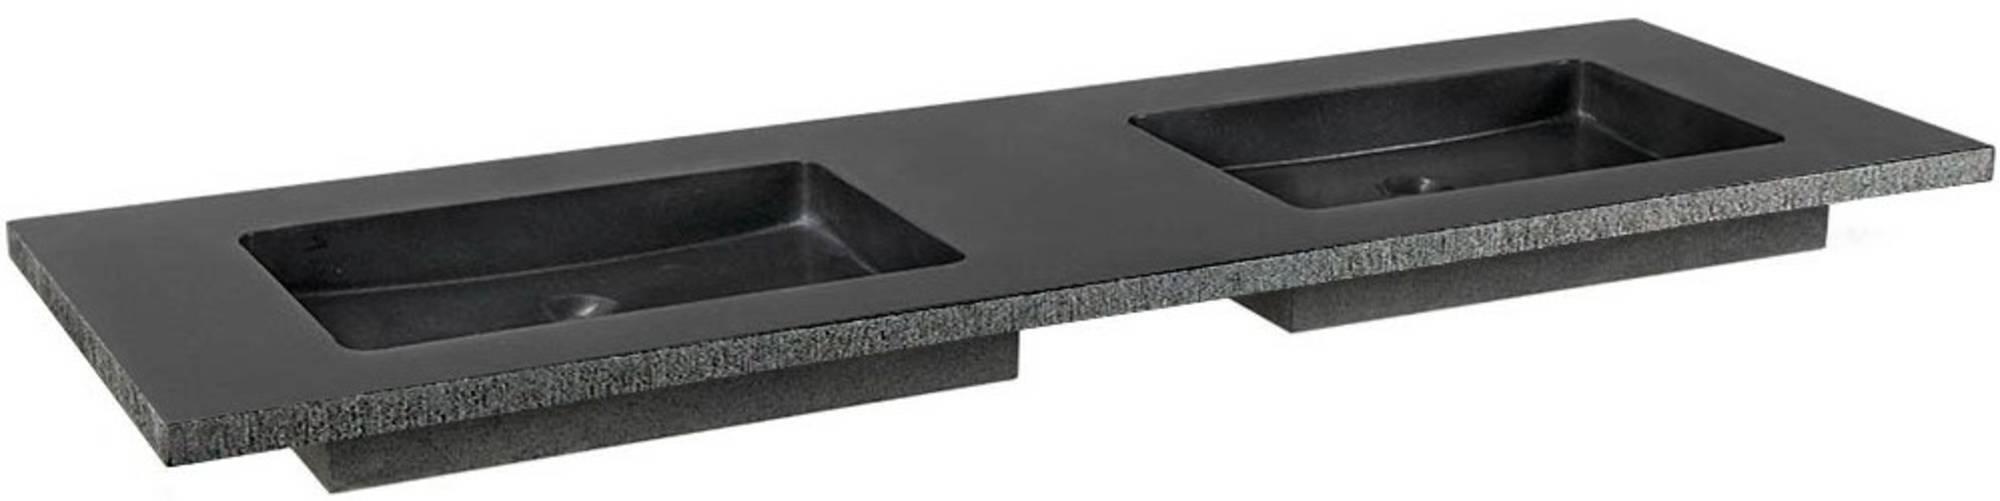 Ben Naturno Wastafel Graniet Gezoet Gefrijnd 160,5x51,5x3 cm 2 Krg. Zwart